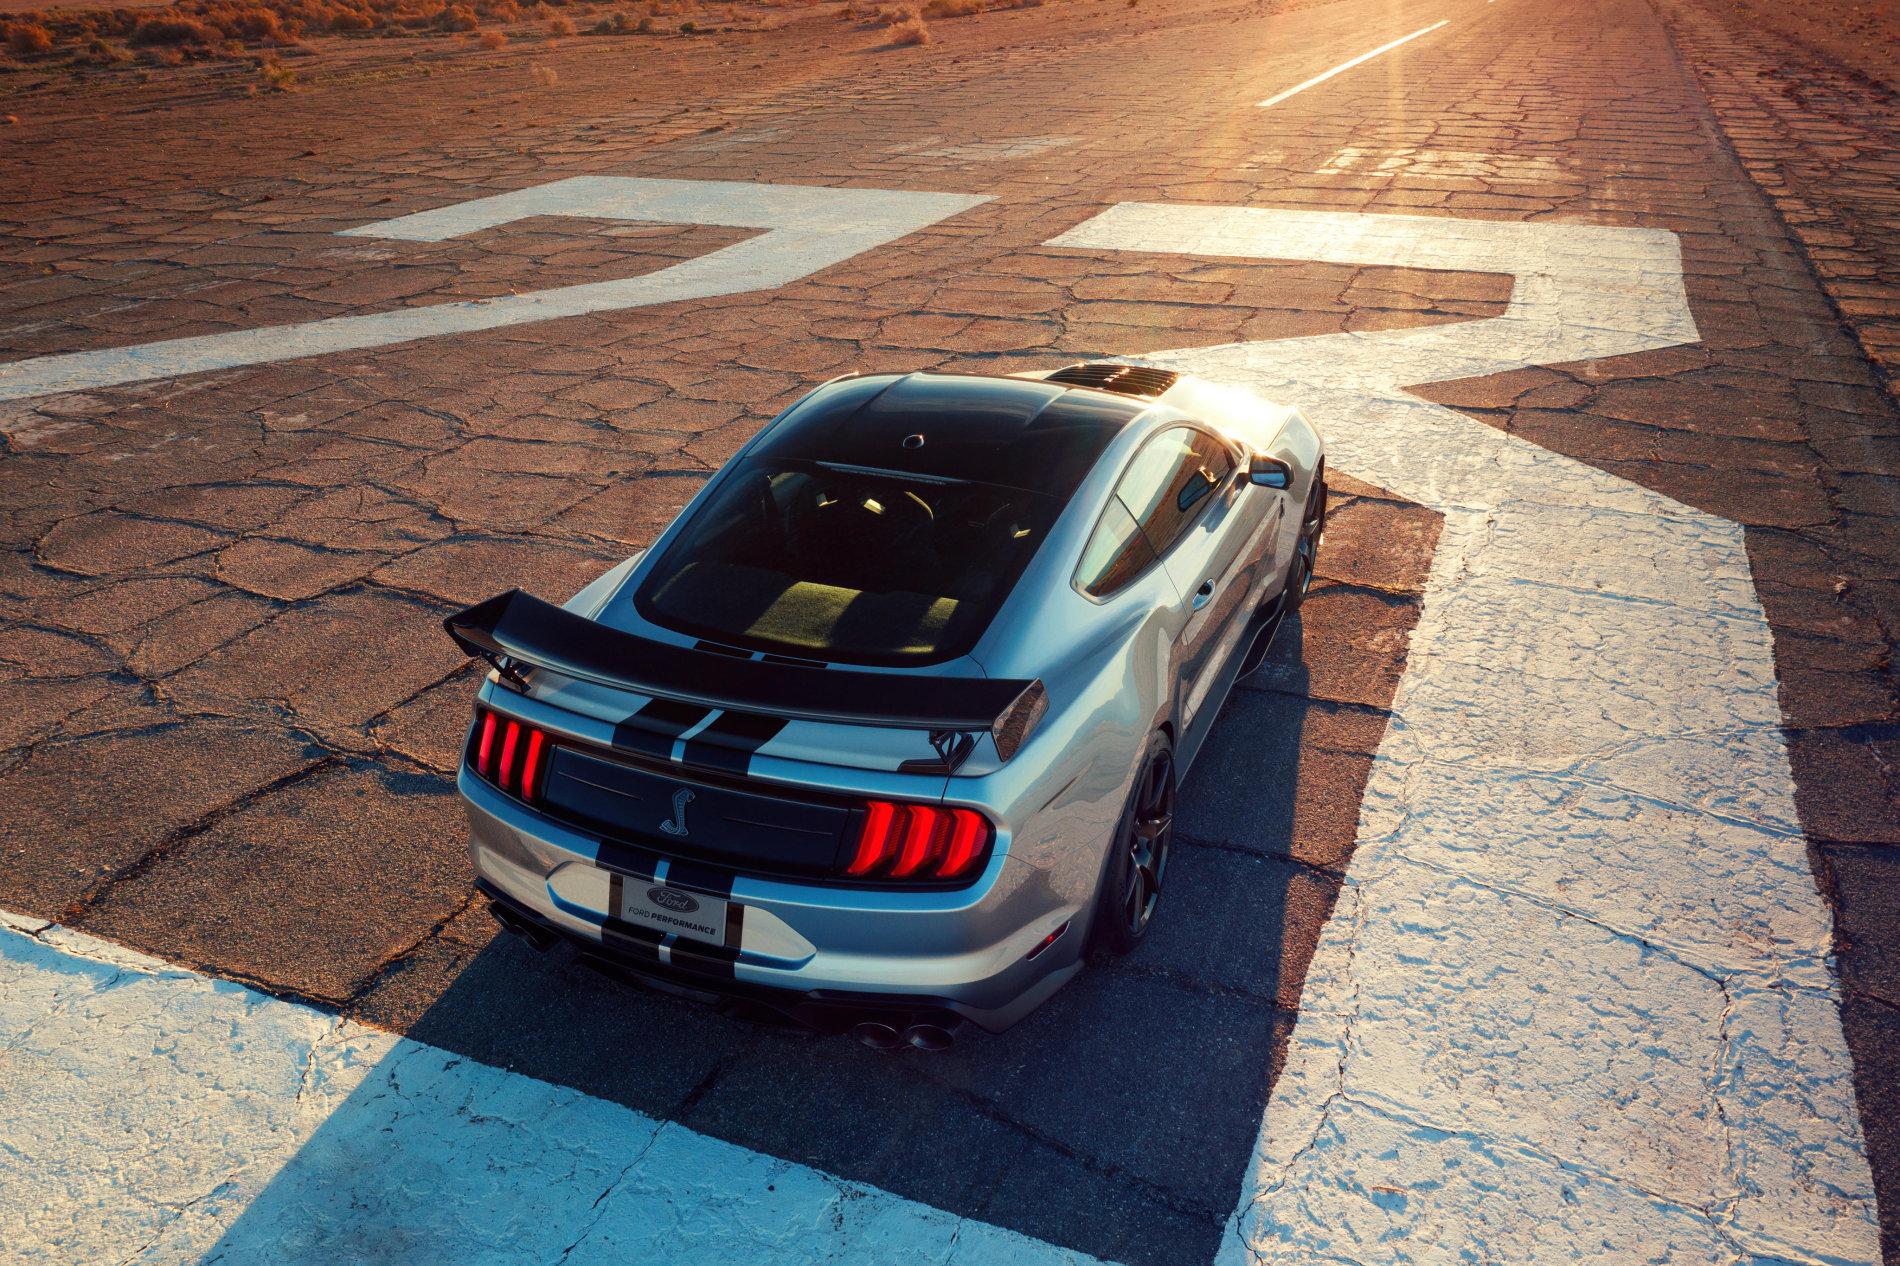 Ford Mustang Shelby GT500 - Ford Mustang Shelby GT500